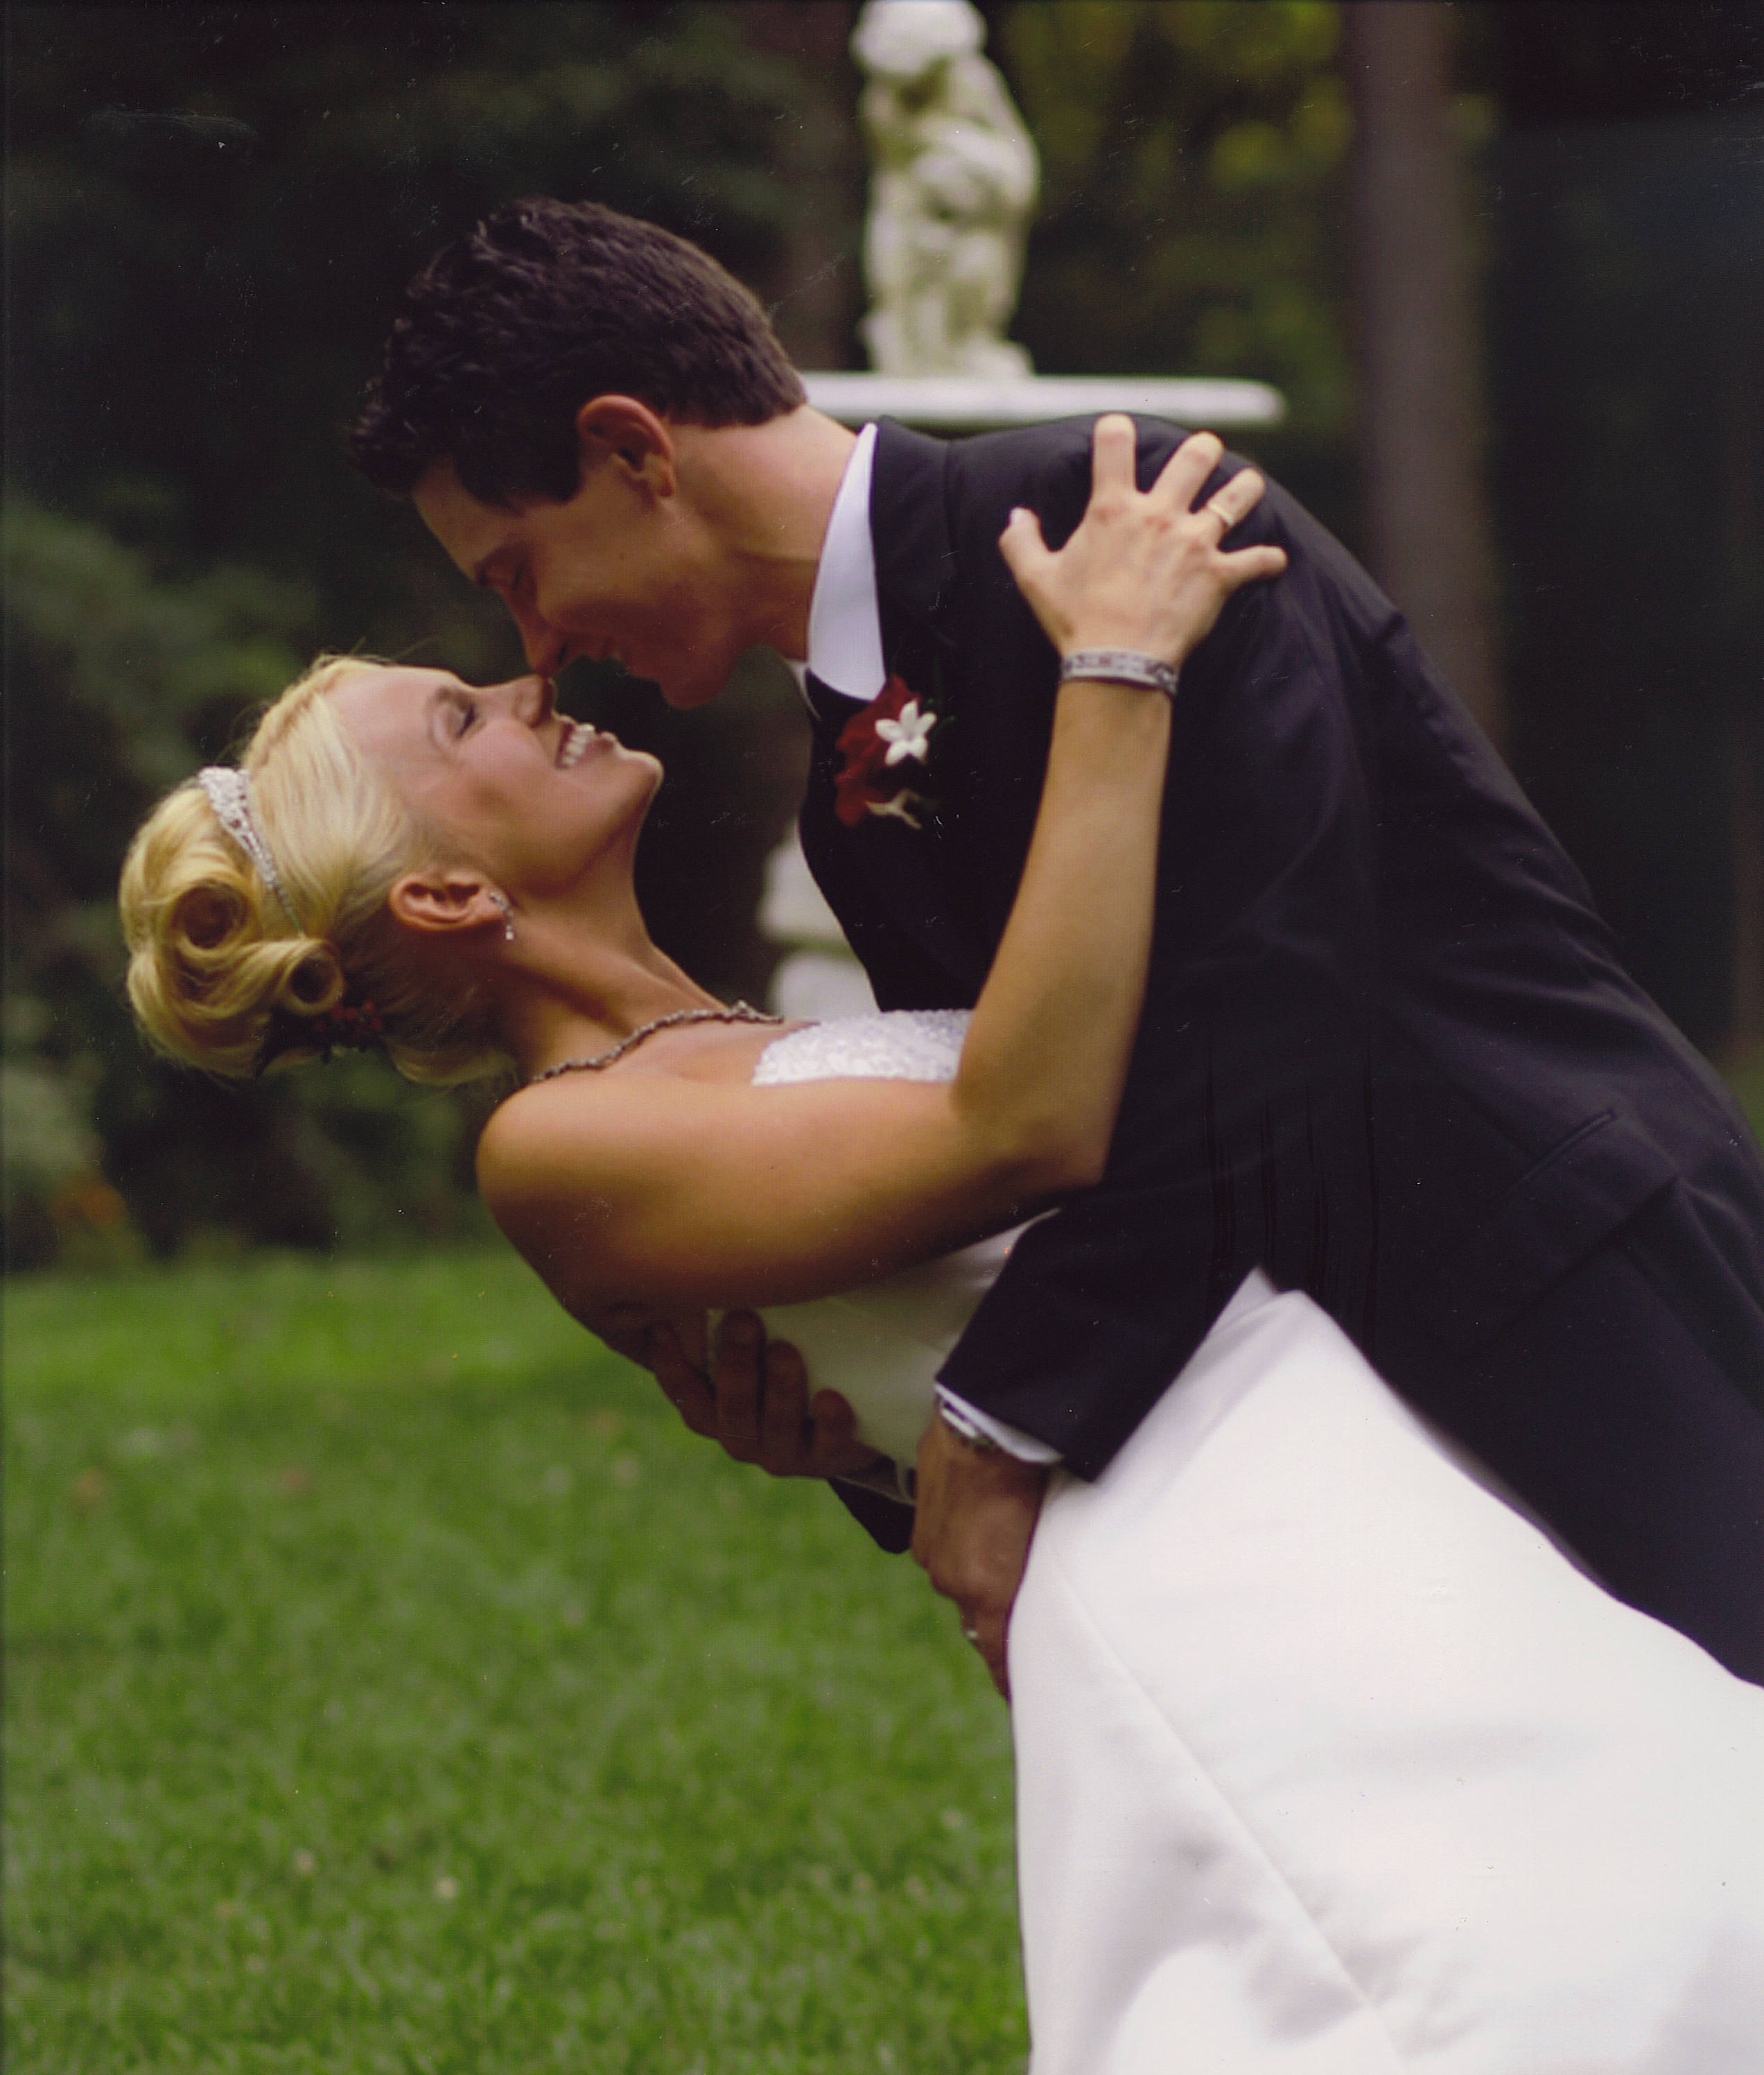 Flowers & Decor, Wedding Dresses, Fashion, dress, Garden, Bride, Groom, Fountain, Gramercy mansion